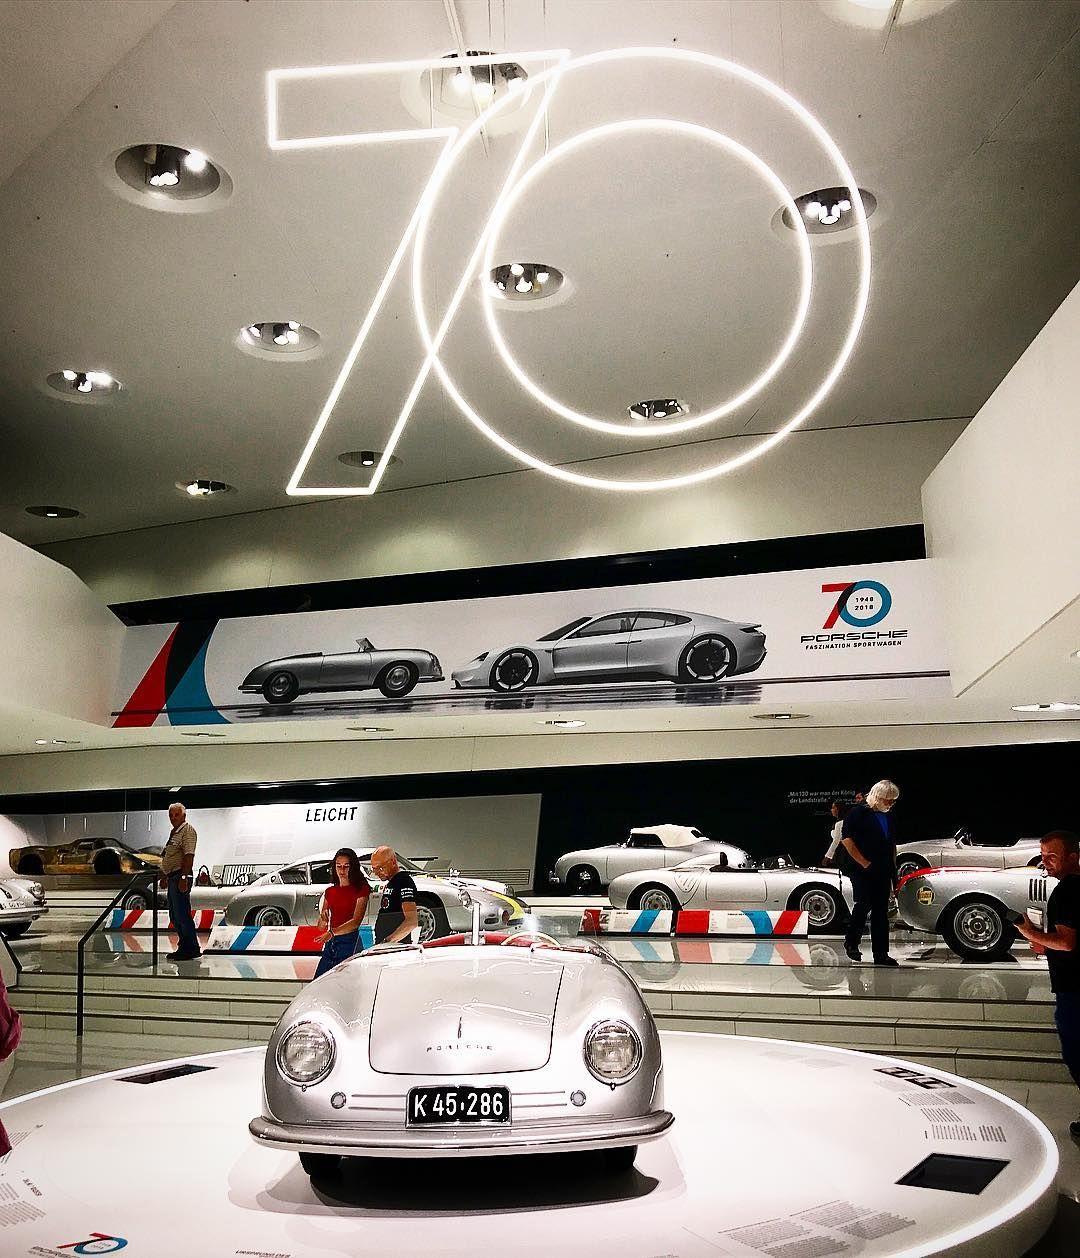 Congrats To 70th Anniversary Porsche Festival Stuttgart Stuggi Home 0711 Heimat Liebe Sunny Saturday Benztown Schwaben Porsche Benz Stuttgart